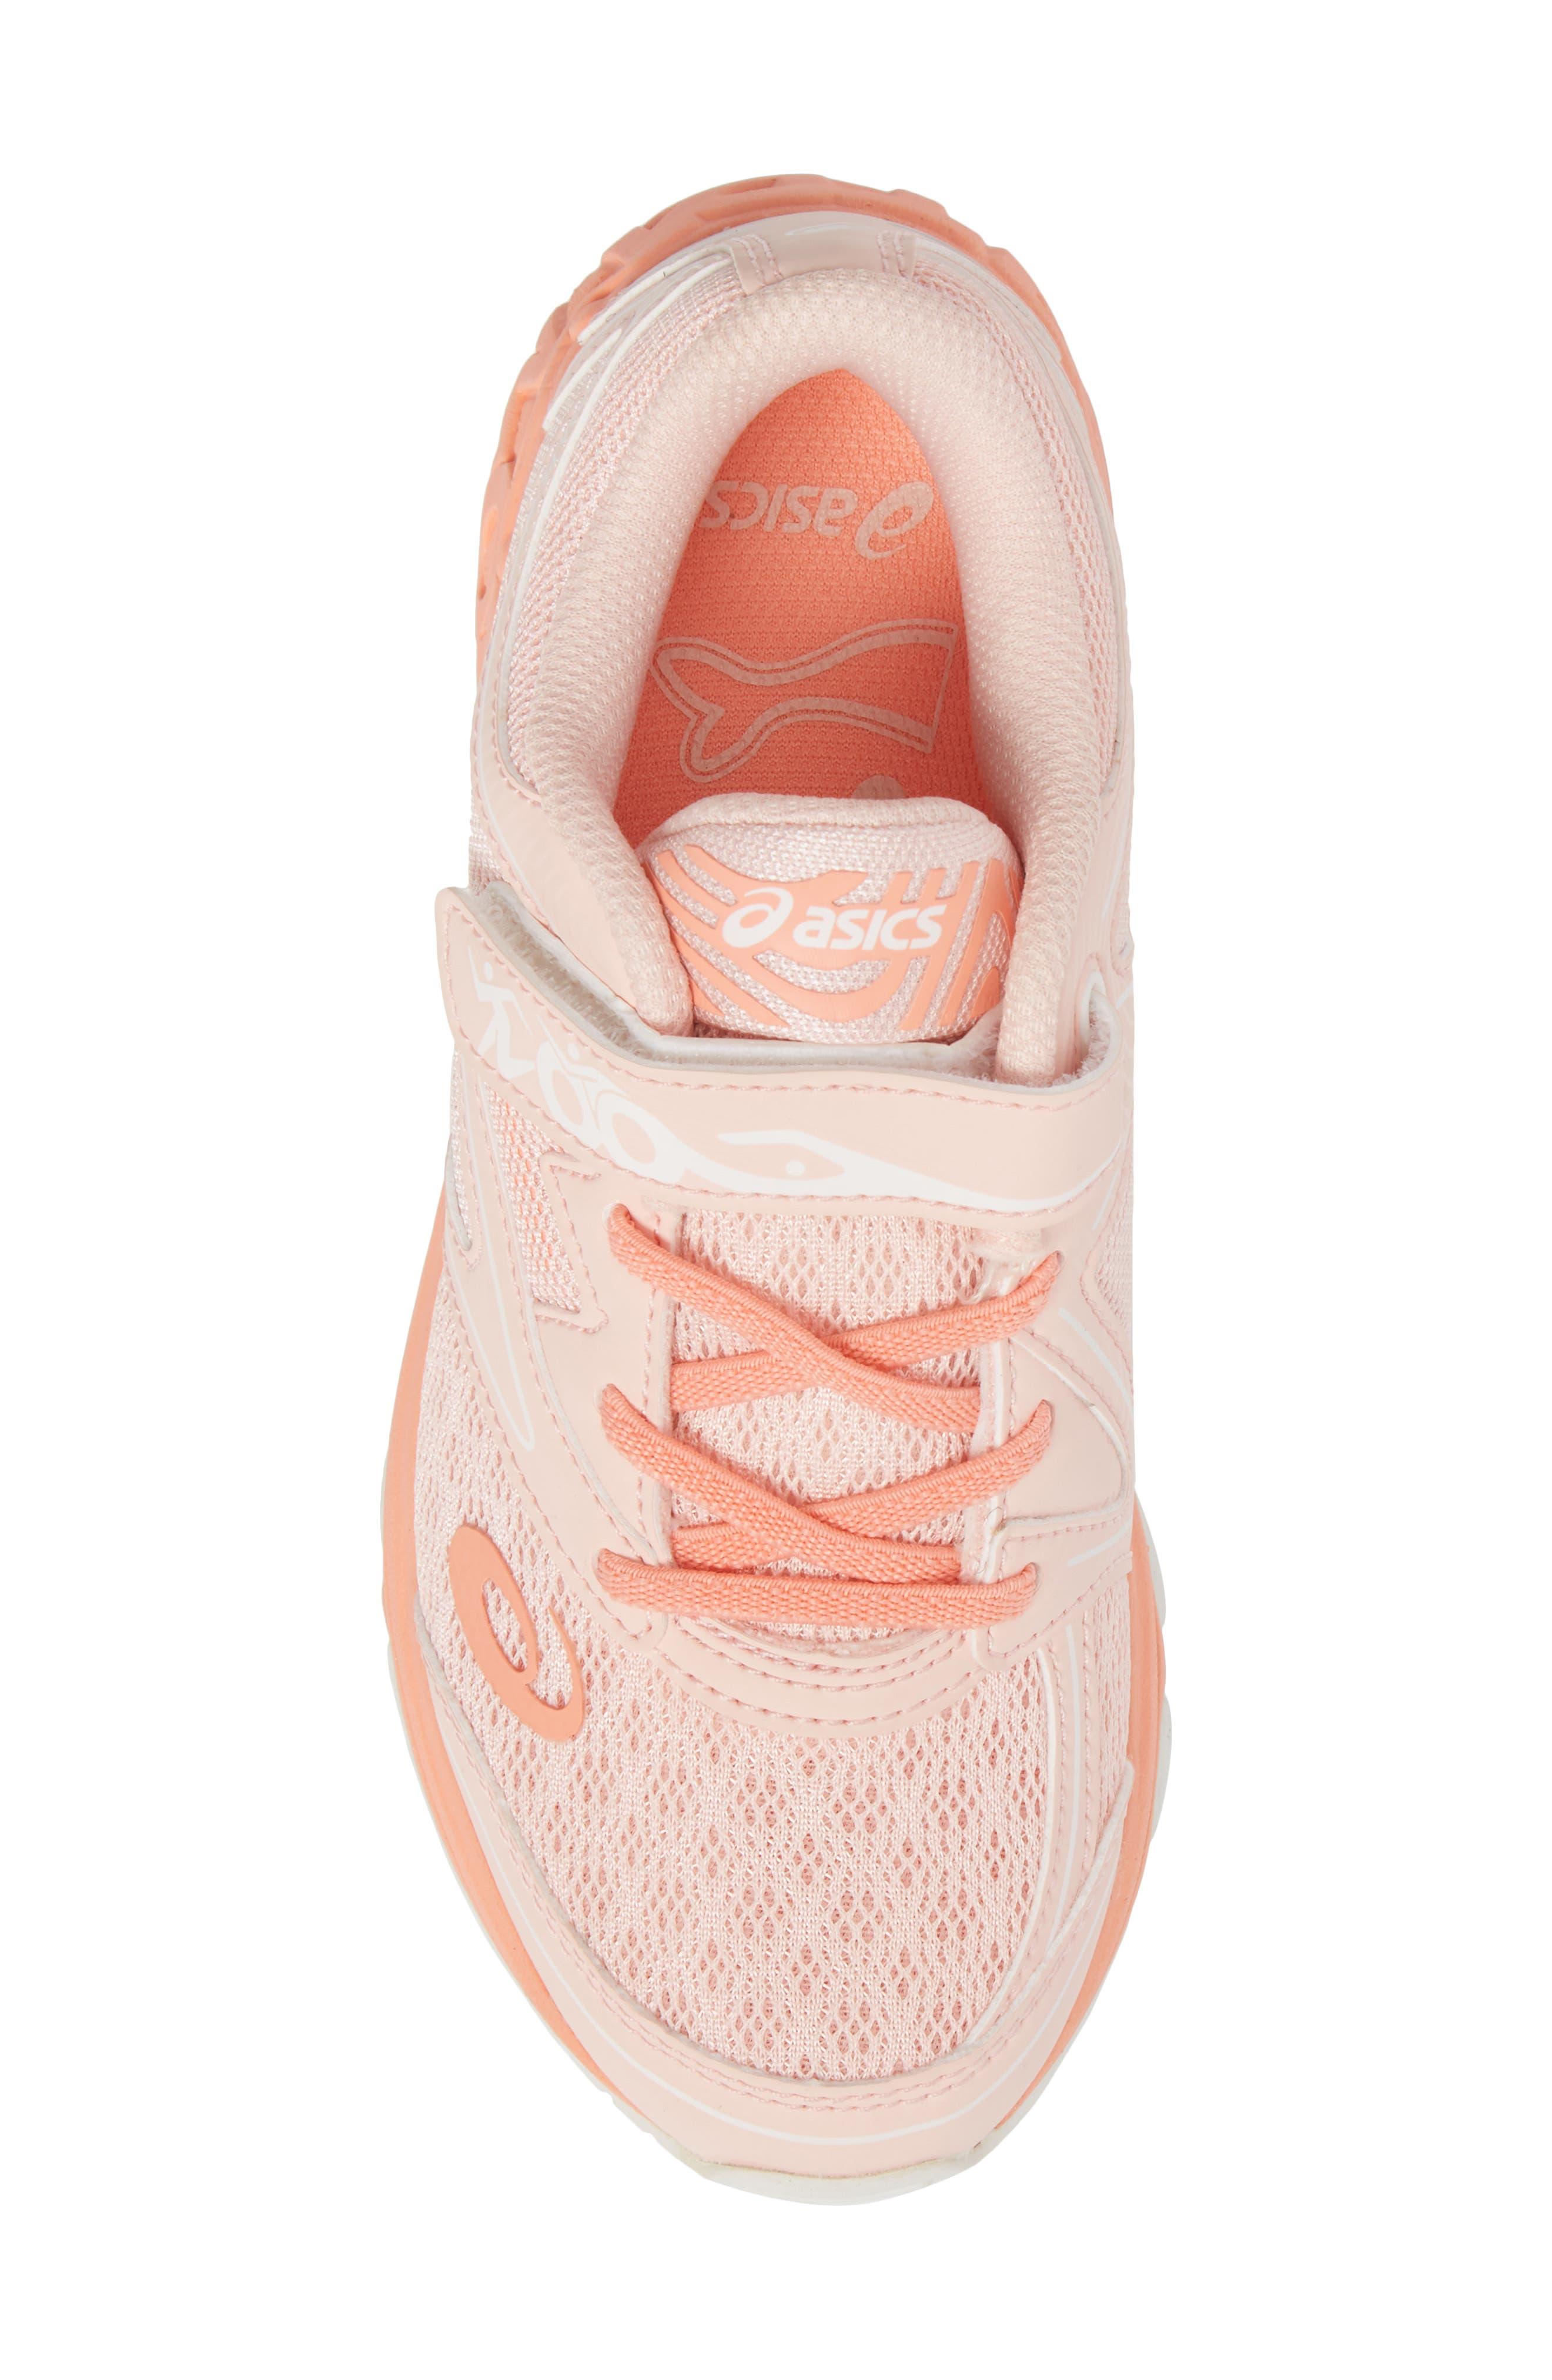 Noosa PS Sneaker,                             Alternate thumbnail 5, color,                             Seashell Pink/ Begonia/ White